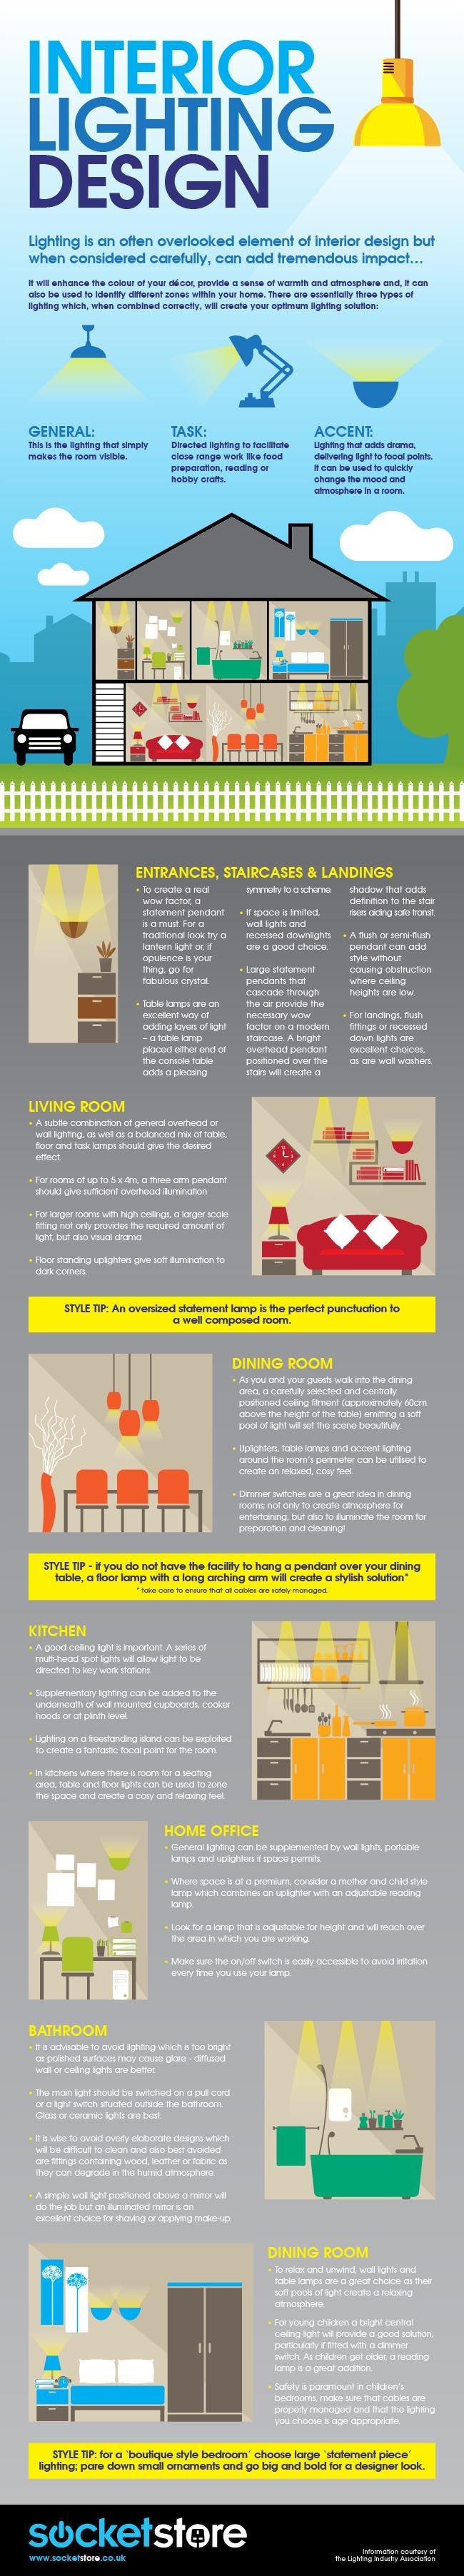 Infographic Interior Lighting Design | Infographics Creator